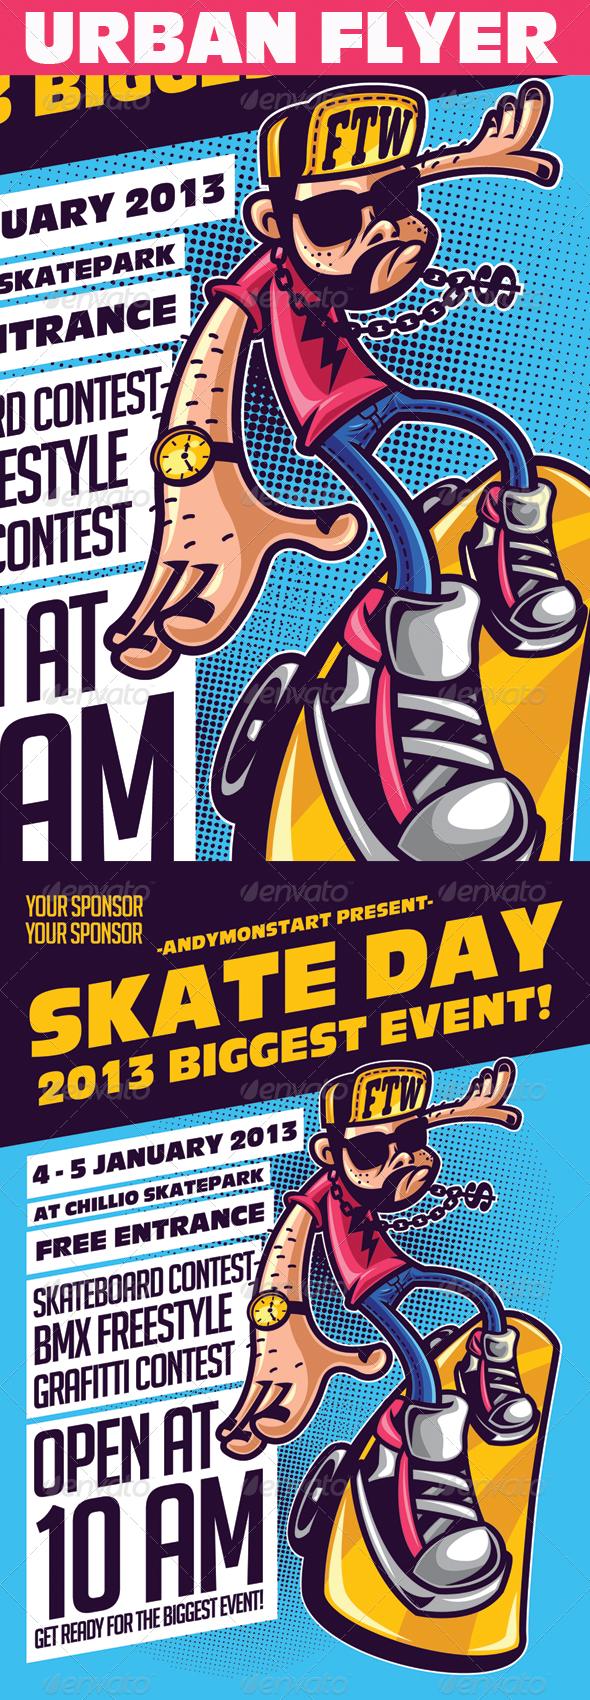 Skate Day Urban Event Flyer Event flyer, Urban graffiti